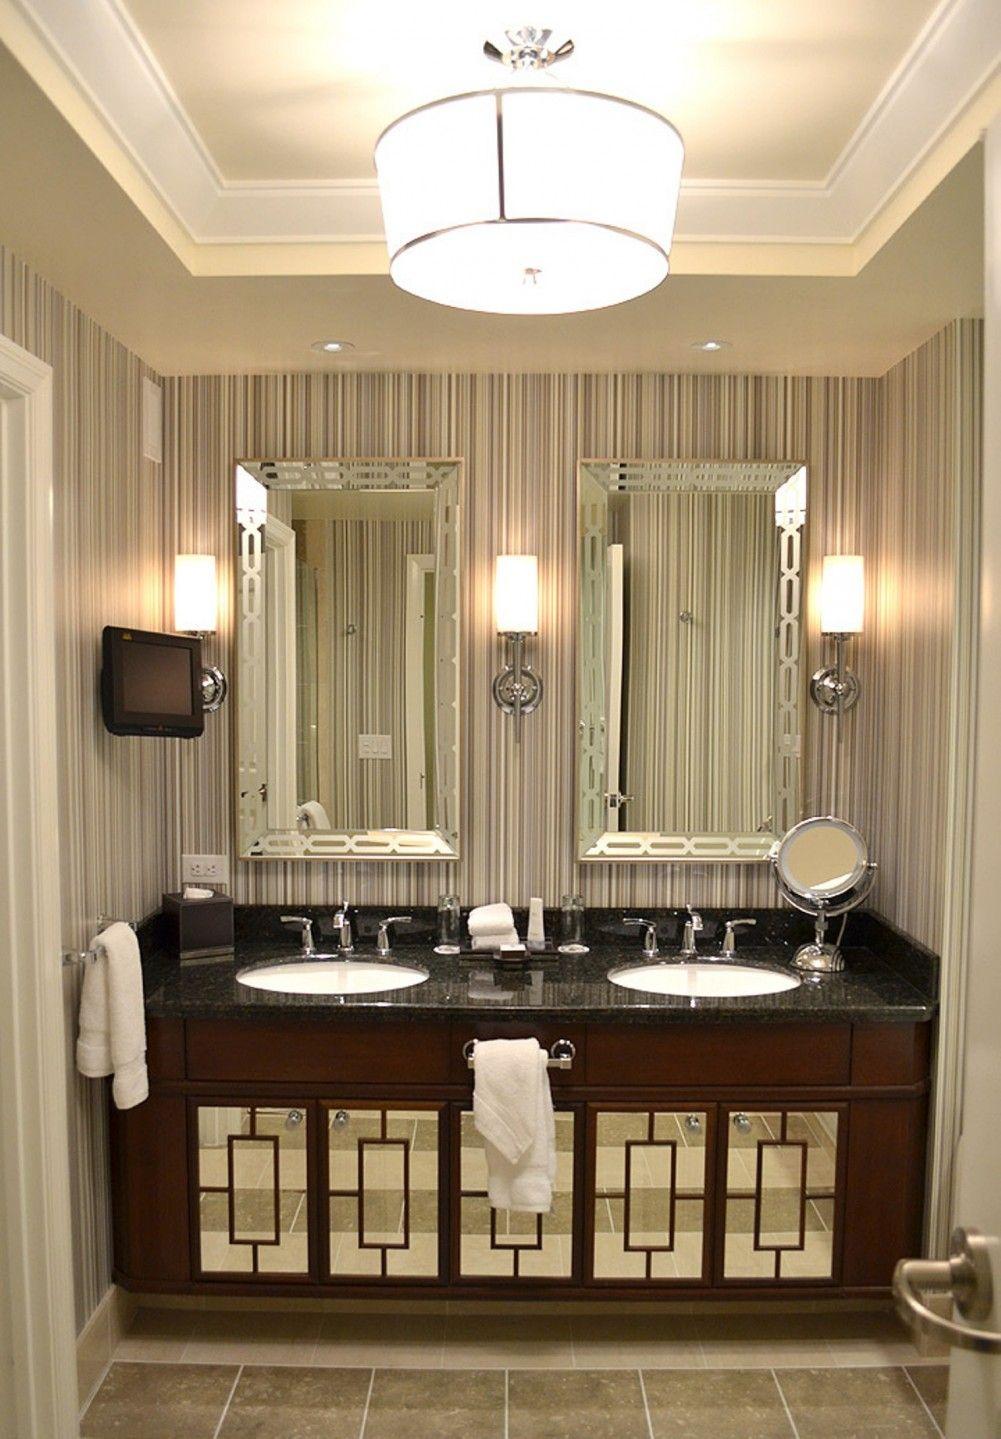 bathroom lighting sconces or overhead | House Interior Design ...